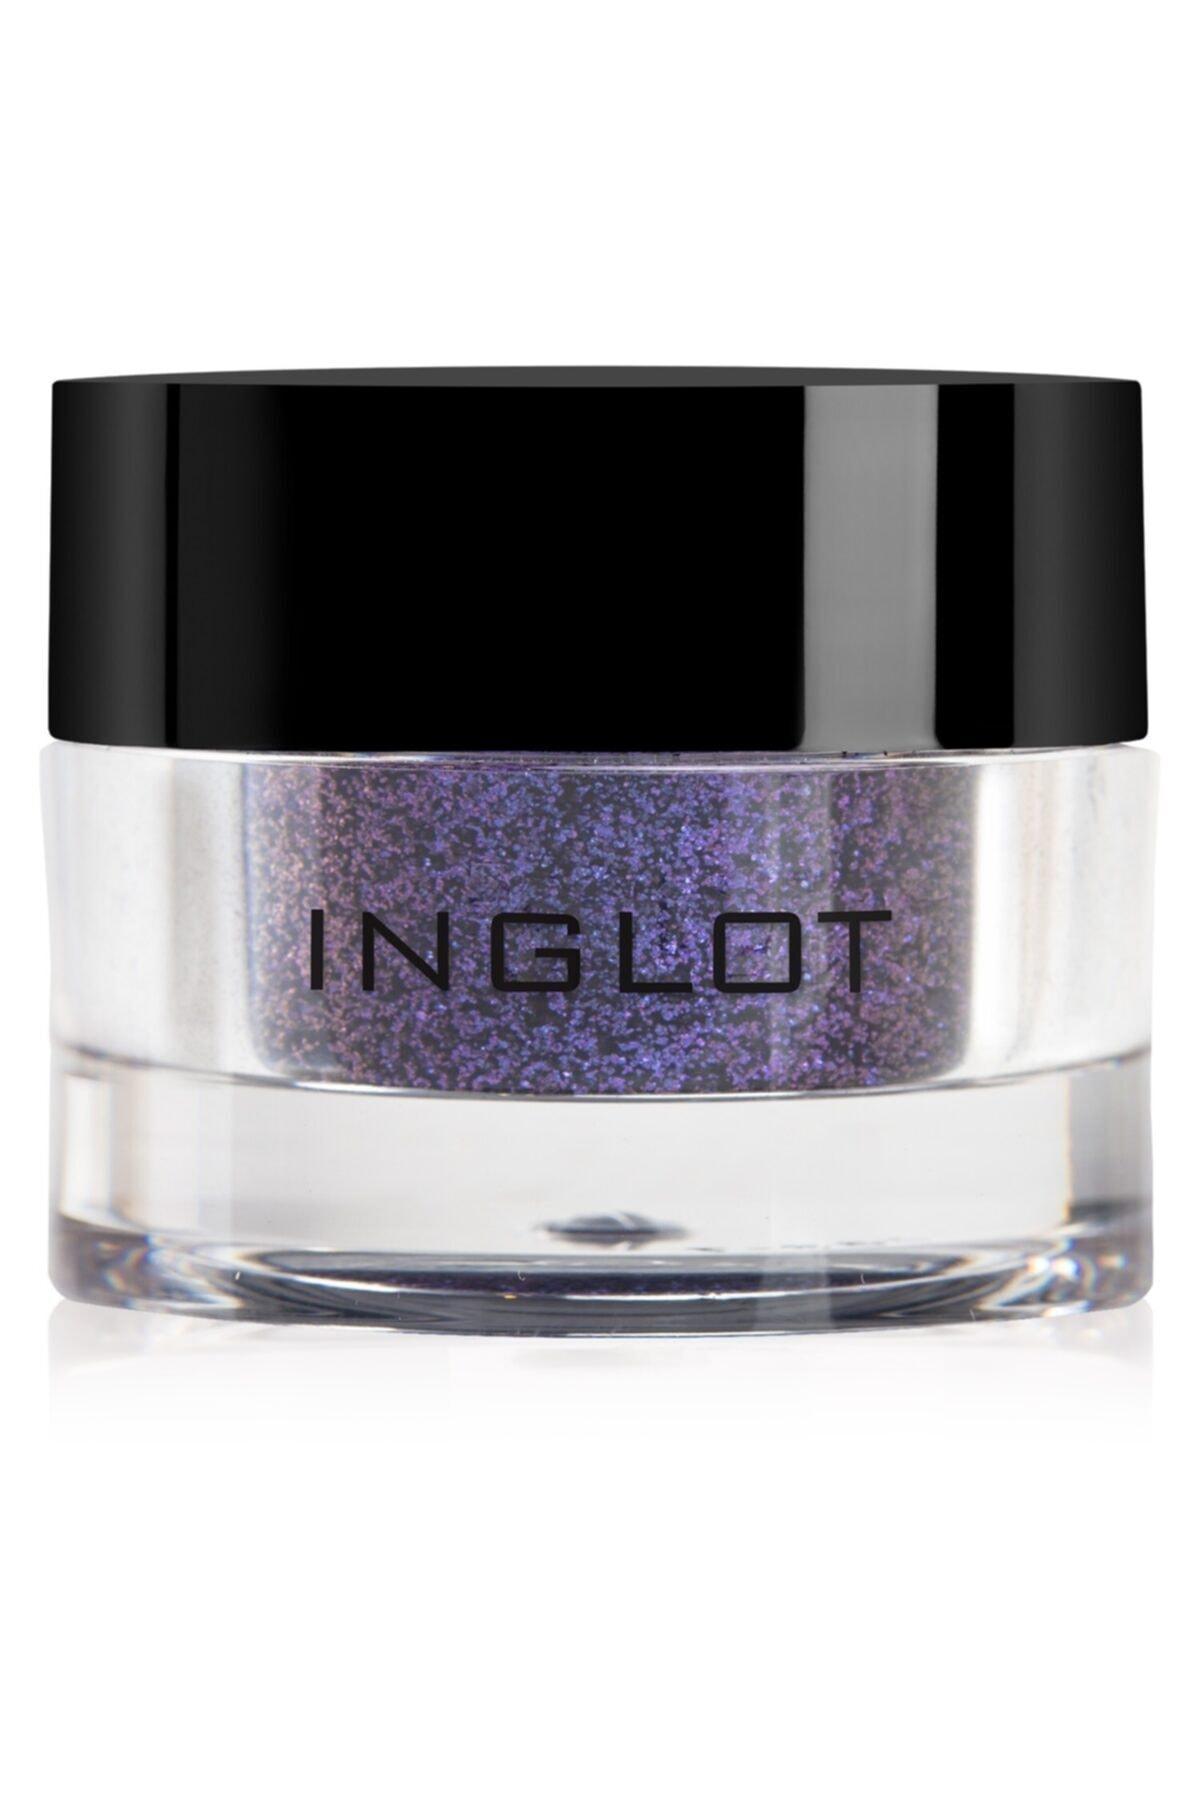 INGLOT Göz Farı-amc Pure Pigment Eye Shadow 135 1